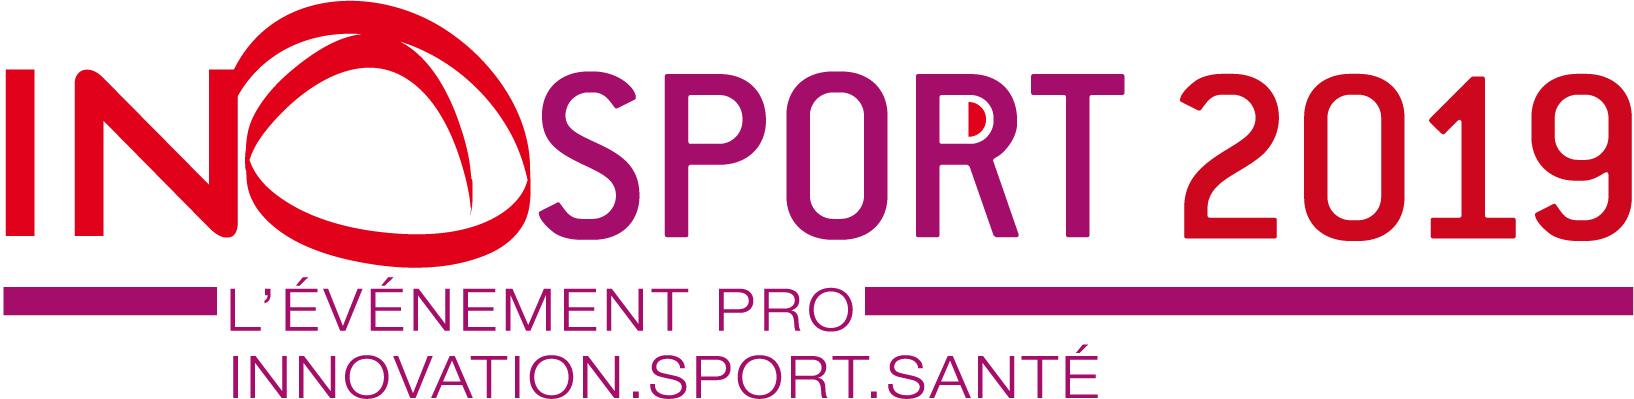 Logo de la startup Inosport